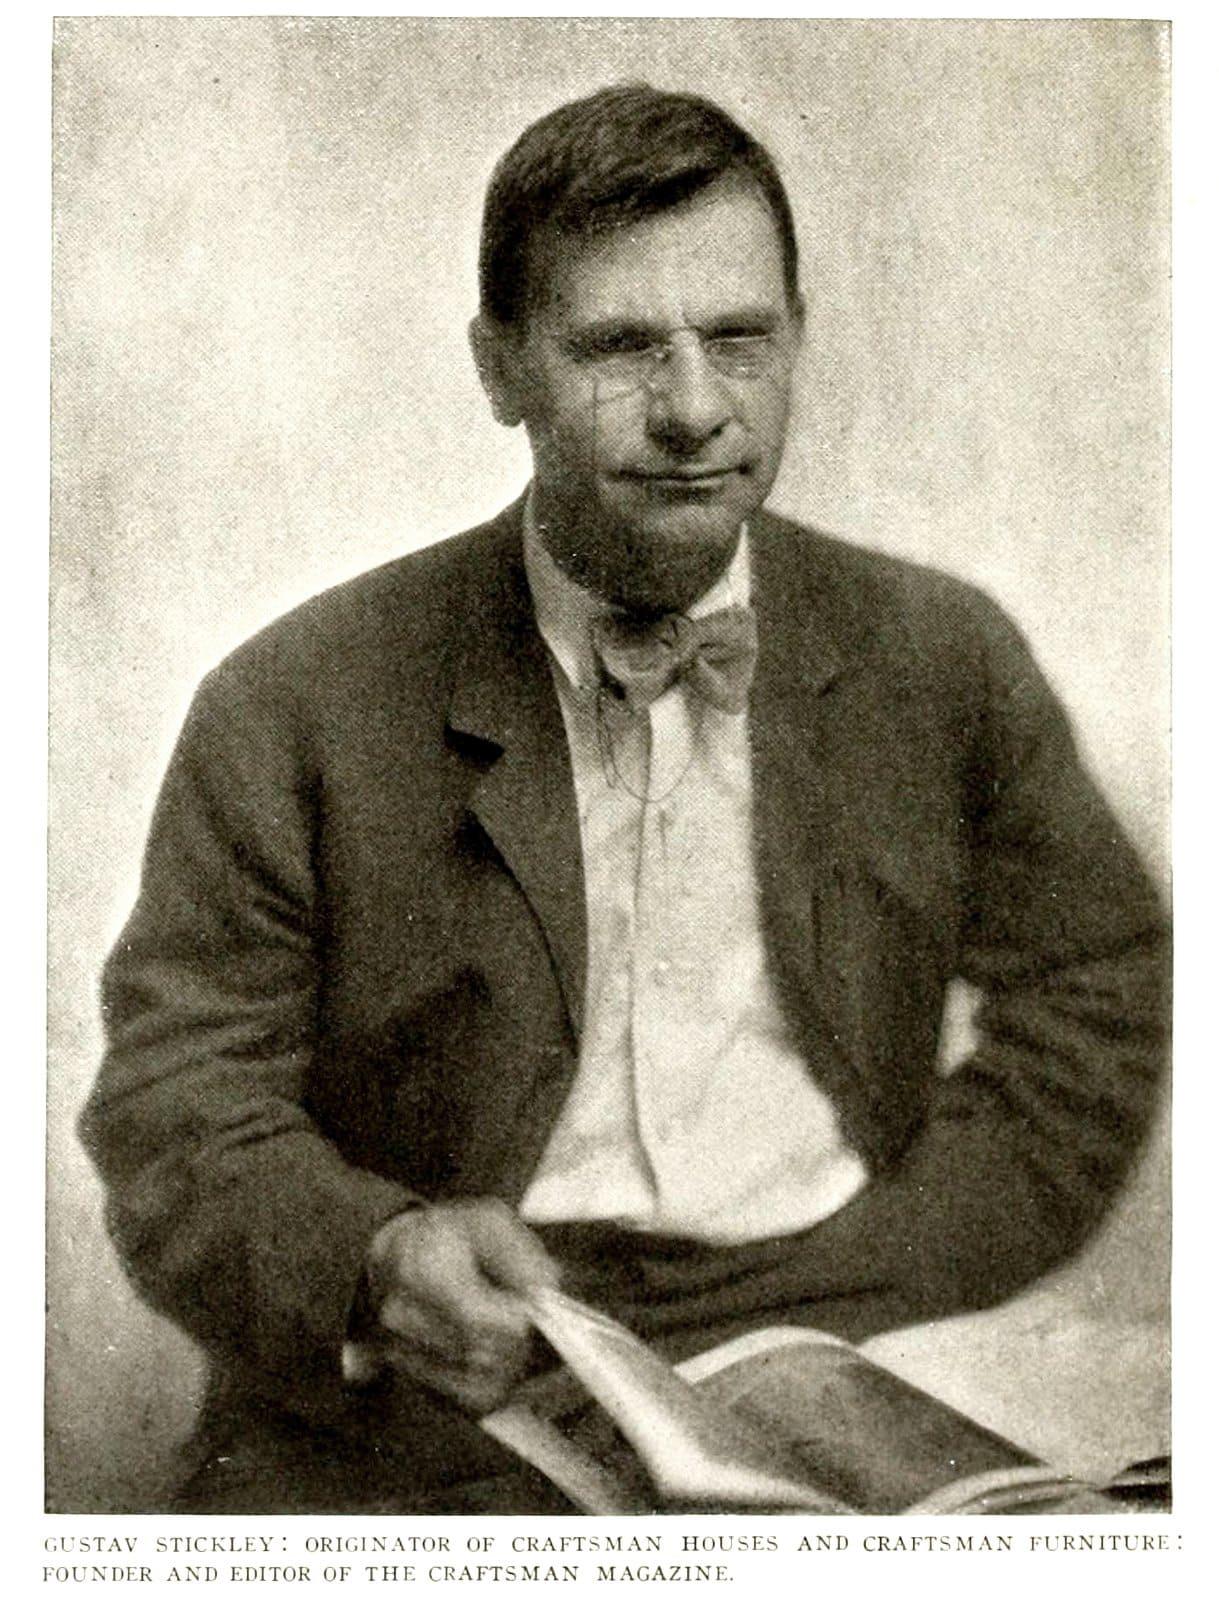 Gustav Stickley portrait - 1900s